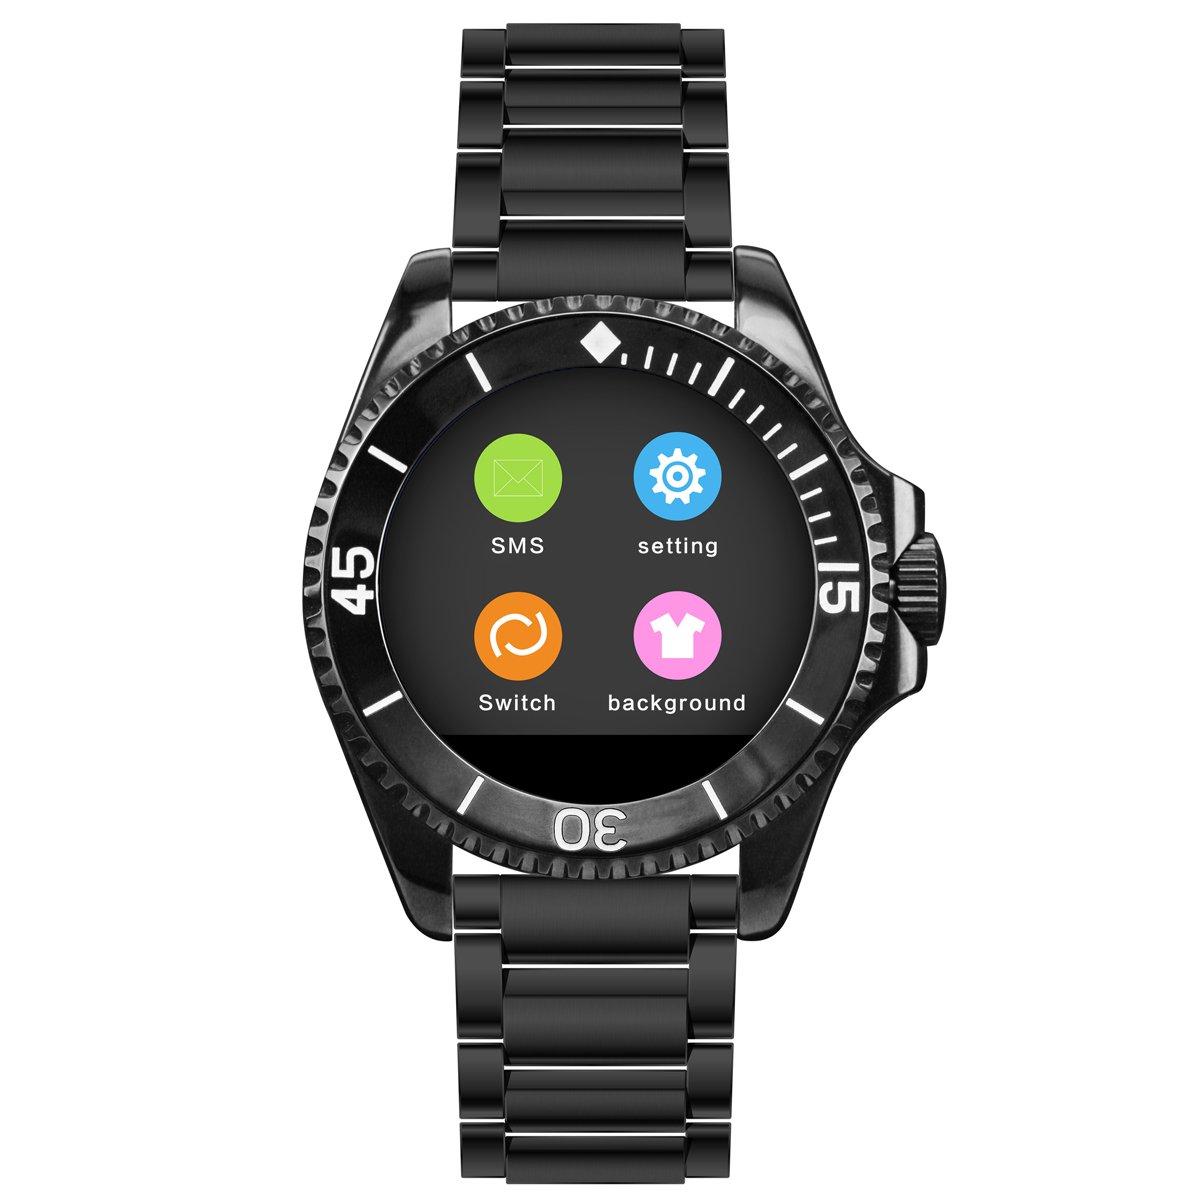 Binlun Smart Watch Bluetoothタッチ画面Watch for iPhone Androidスマートフォン ブラック B071F3JHP3 ブラック ブラック